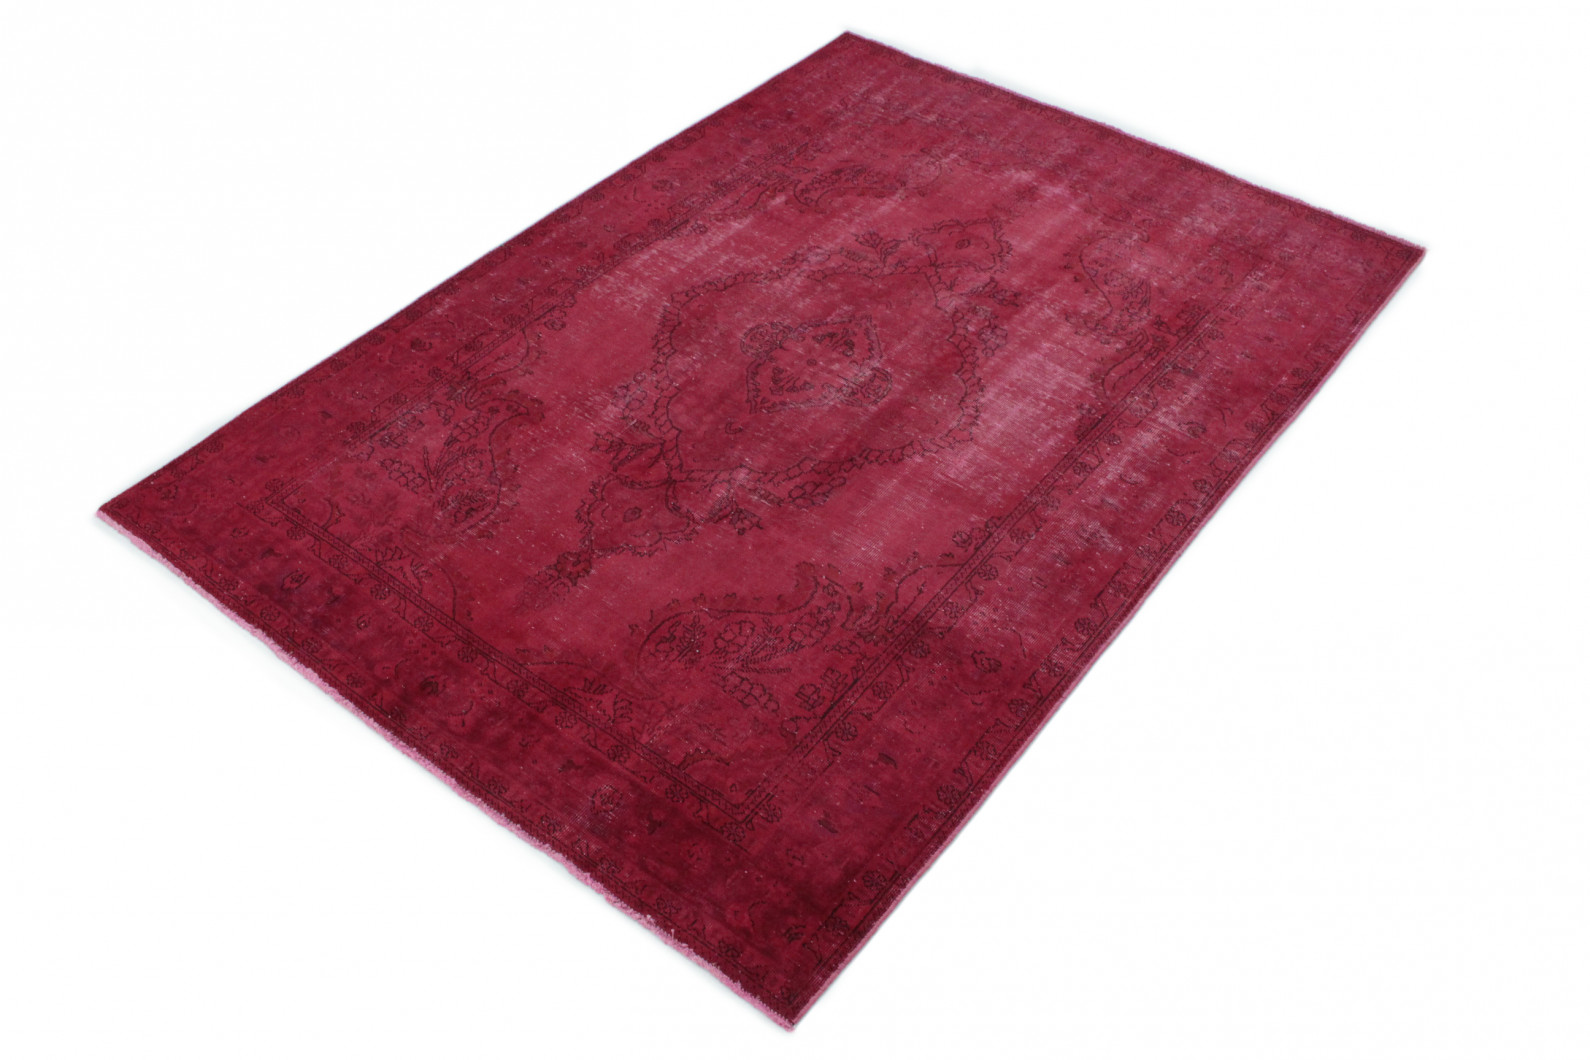 vintage teppich rot in 290x200 1001 167059 bei kaufen. Black Bedroom Furniture Sets. Home Design Ideas